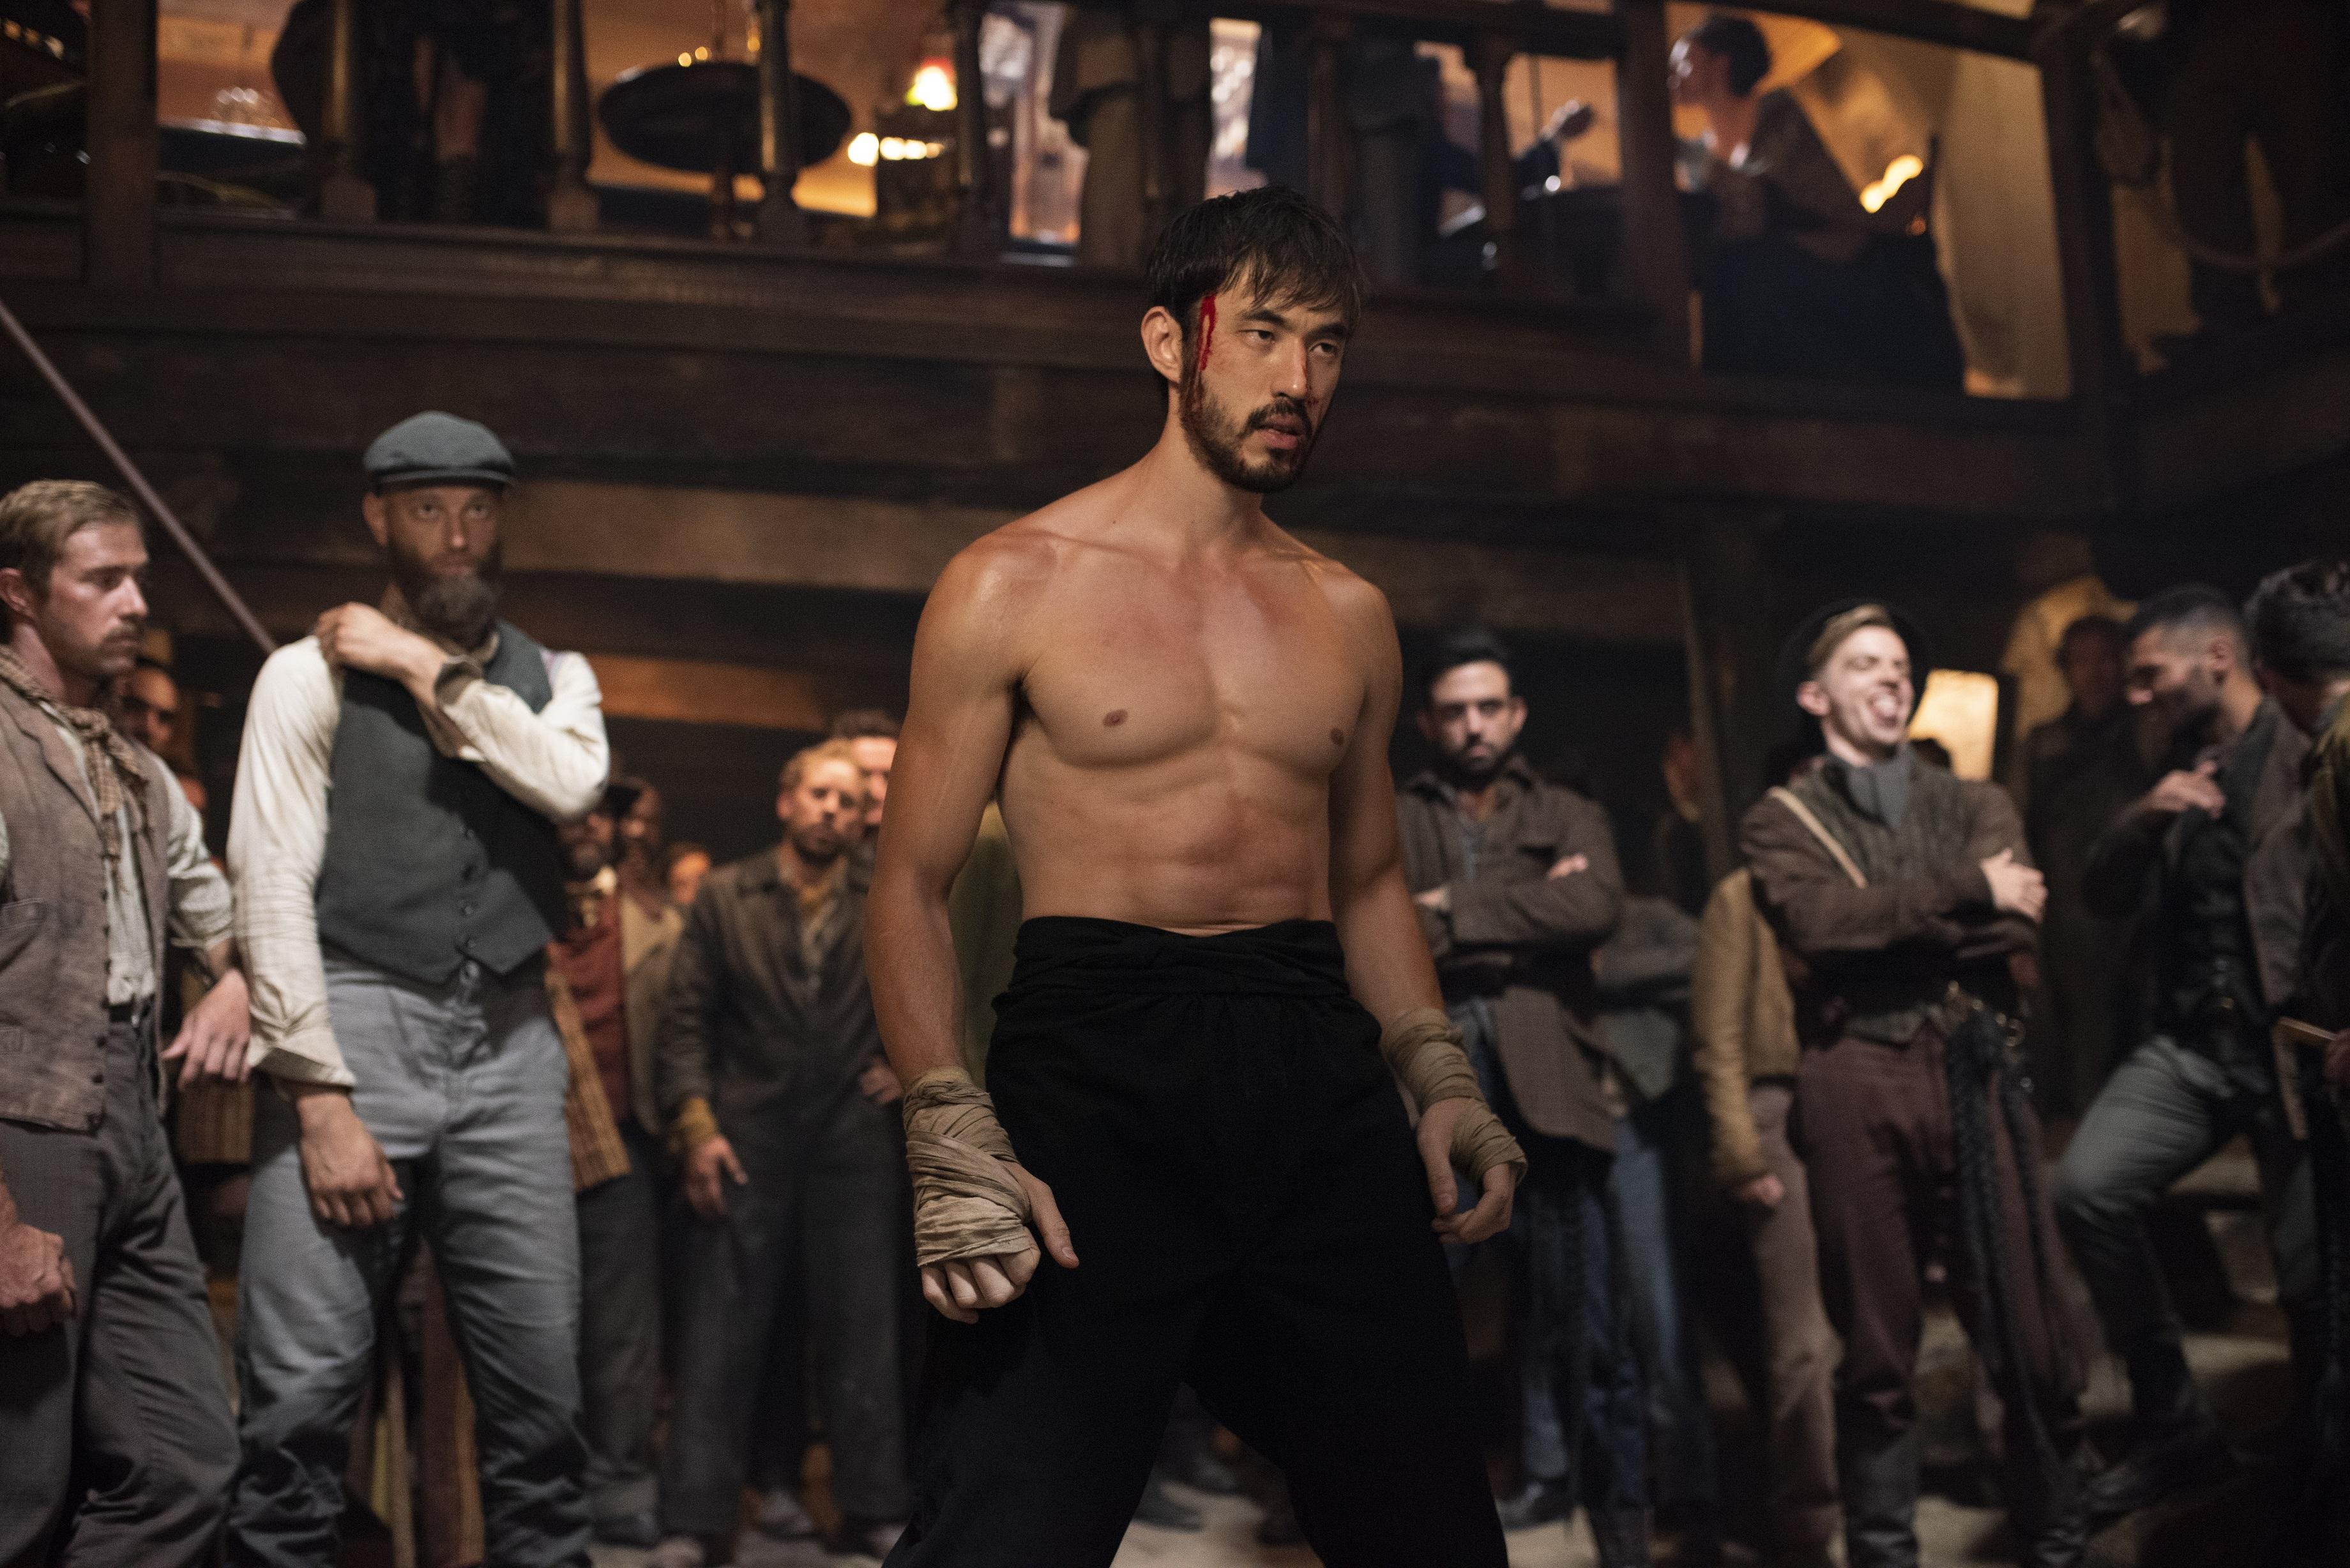 Cinemax武打动作影集《唐人街战士》(Warrior)全新第二季将于周六(10月3日)上午10时独家与美国同步于HBO GO播出。-华纳媒体提供-